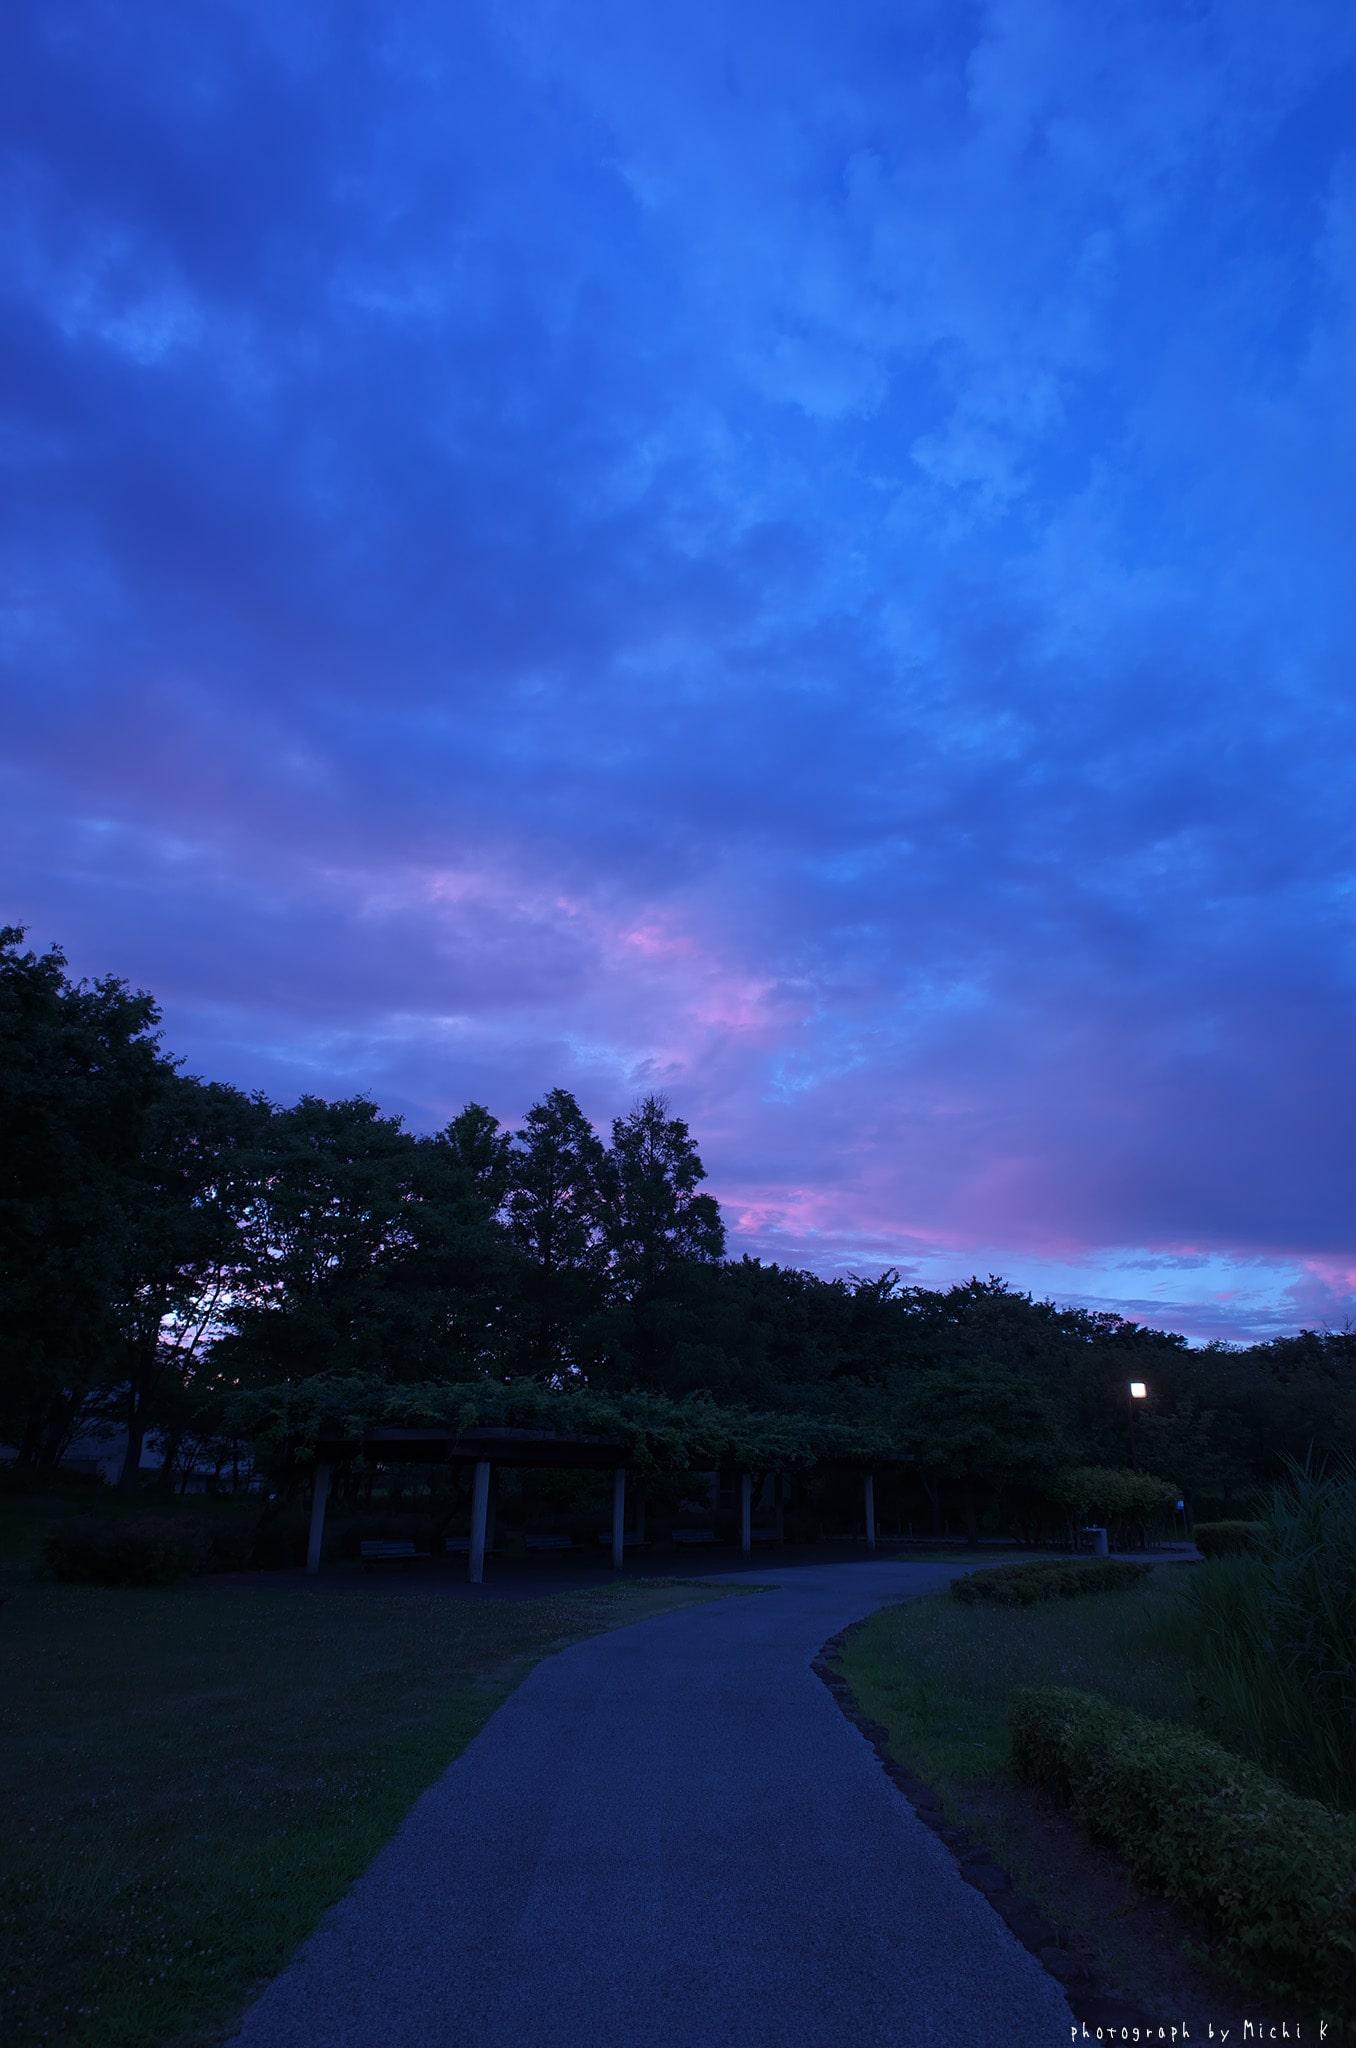 土門拳記念館2019-7-27夕方(写真その8)